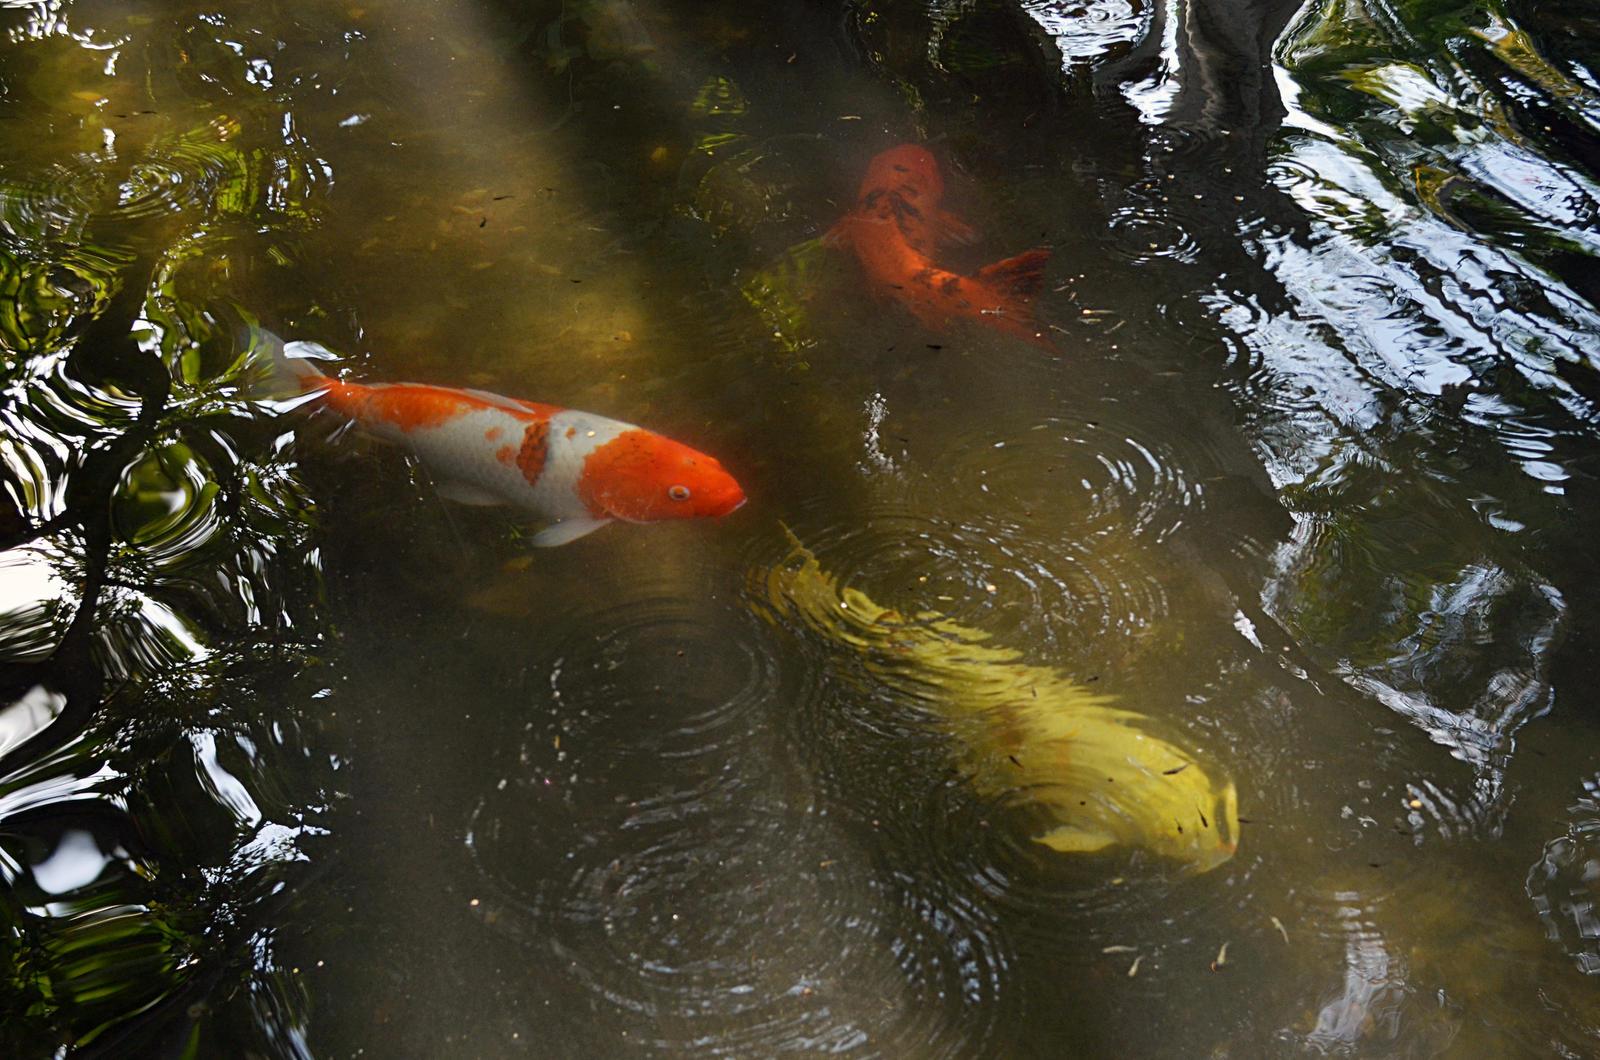 Koi Fish Pond Stock Photo Dsc 0709 By Annamae22 On Deviantart